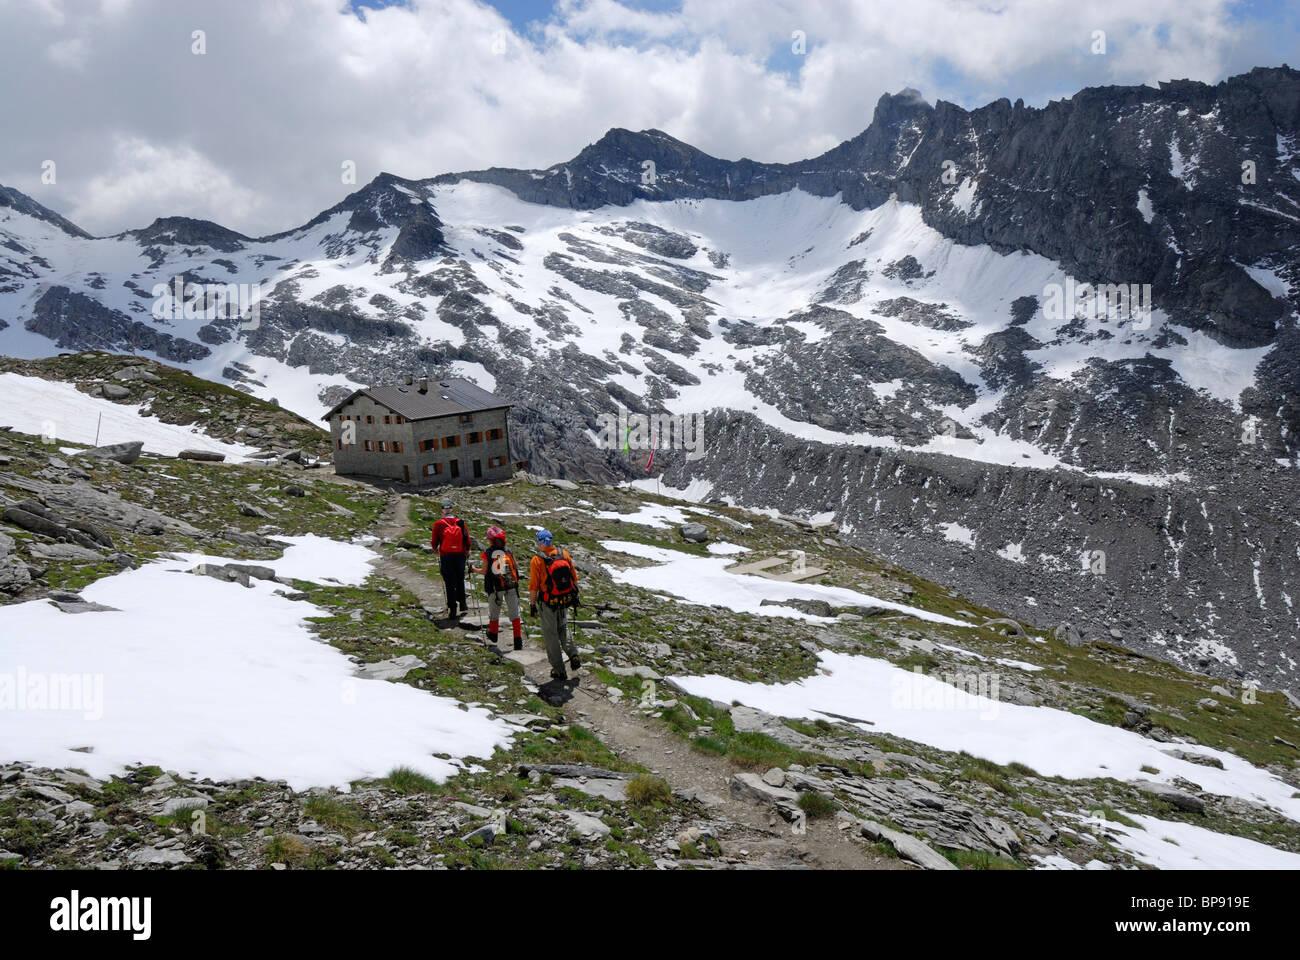 Three mountaineers near hut Hochfeilerhuette, Hochfeiler, Zillertal Alps, South Tyrol, Alto Adige, Italy Stock Photo